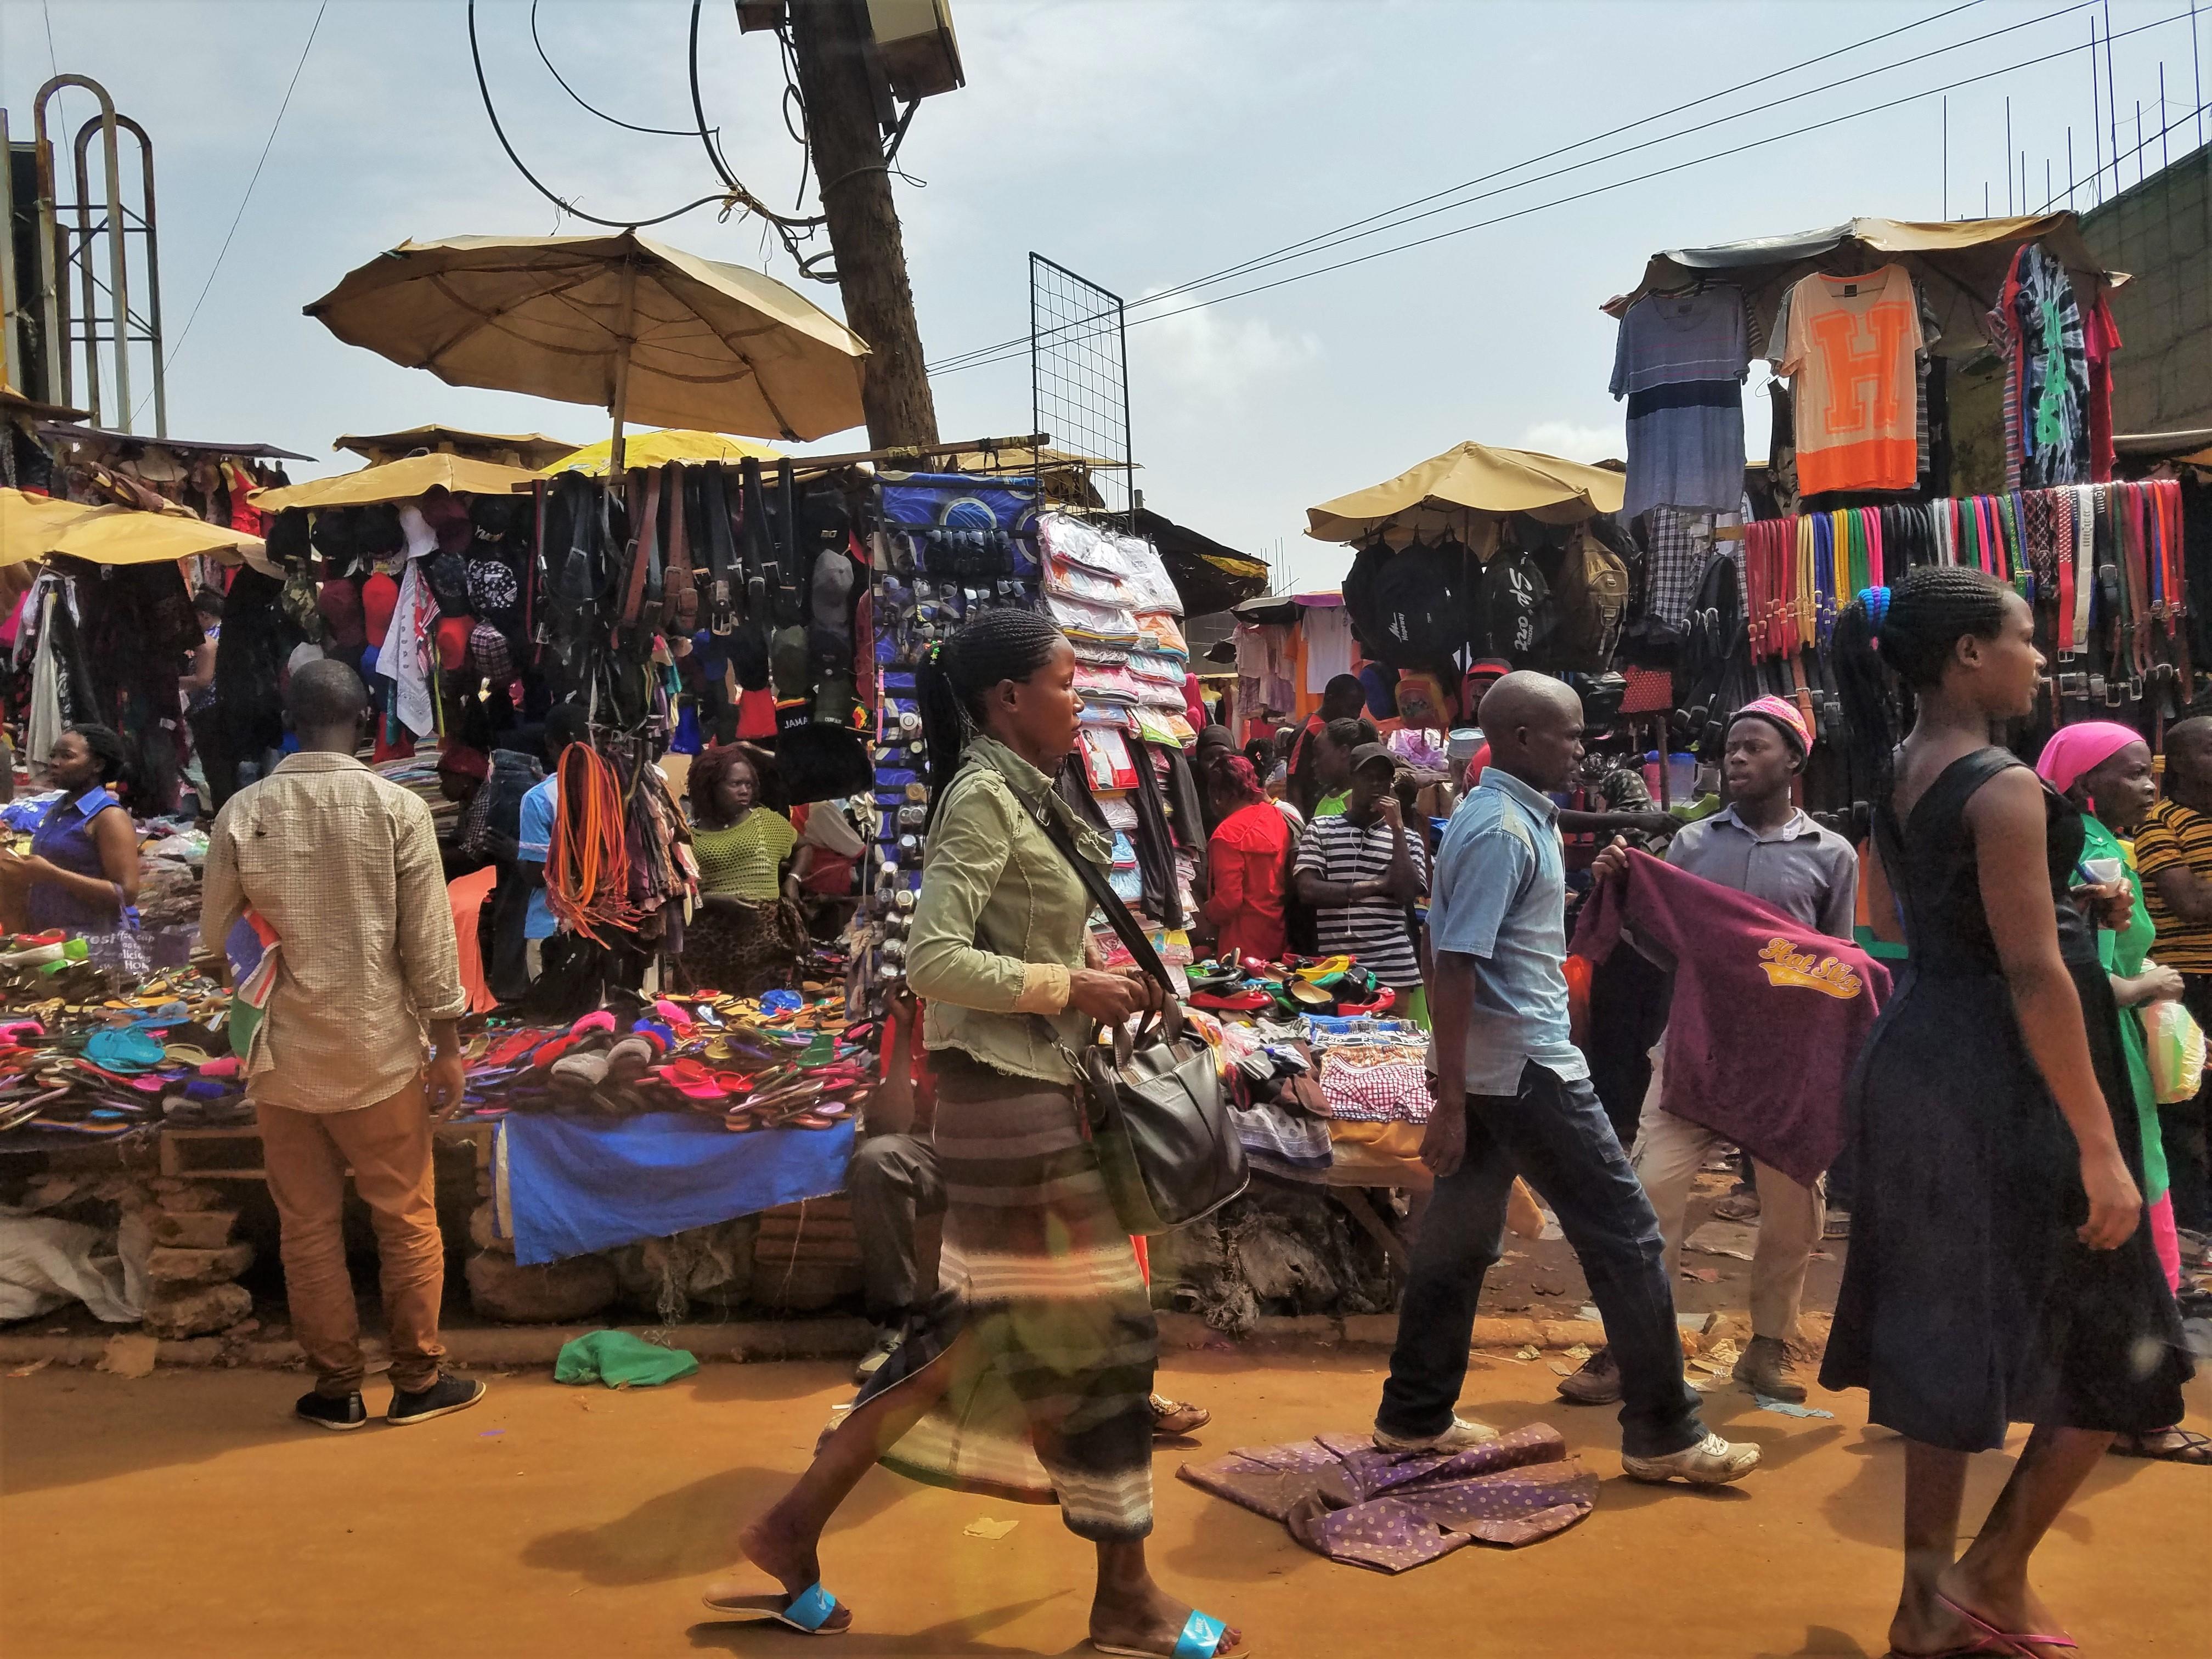 safari, Uganda, Red Chili, Kampala